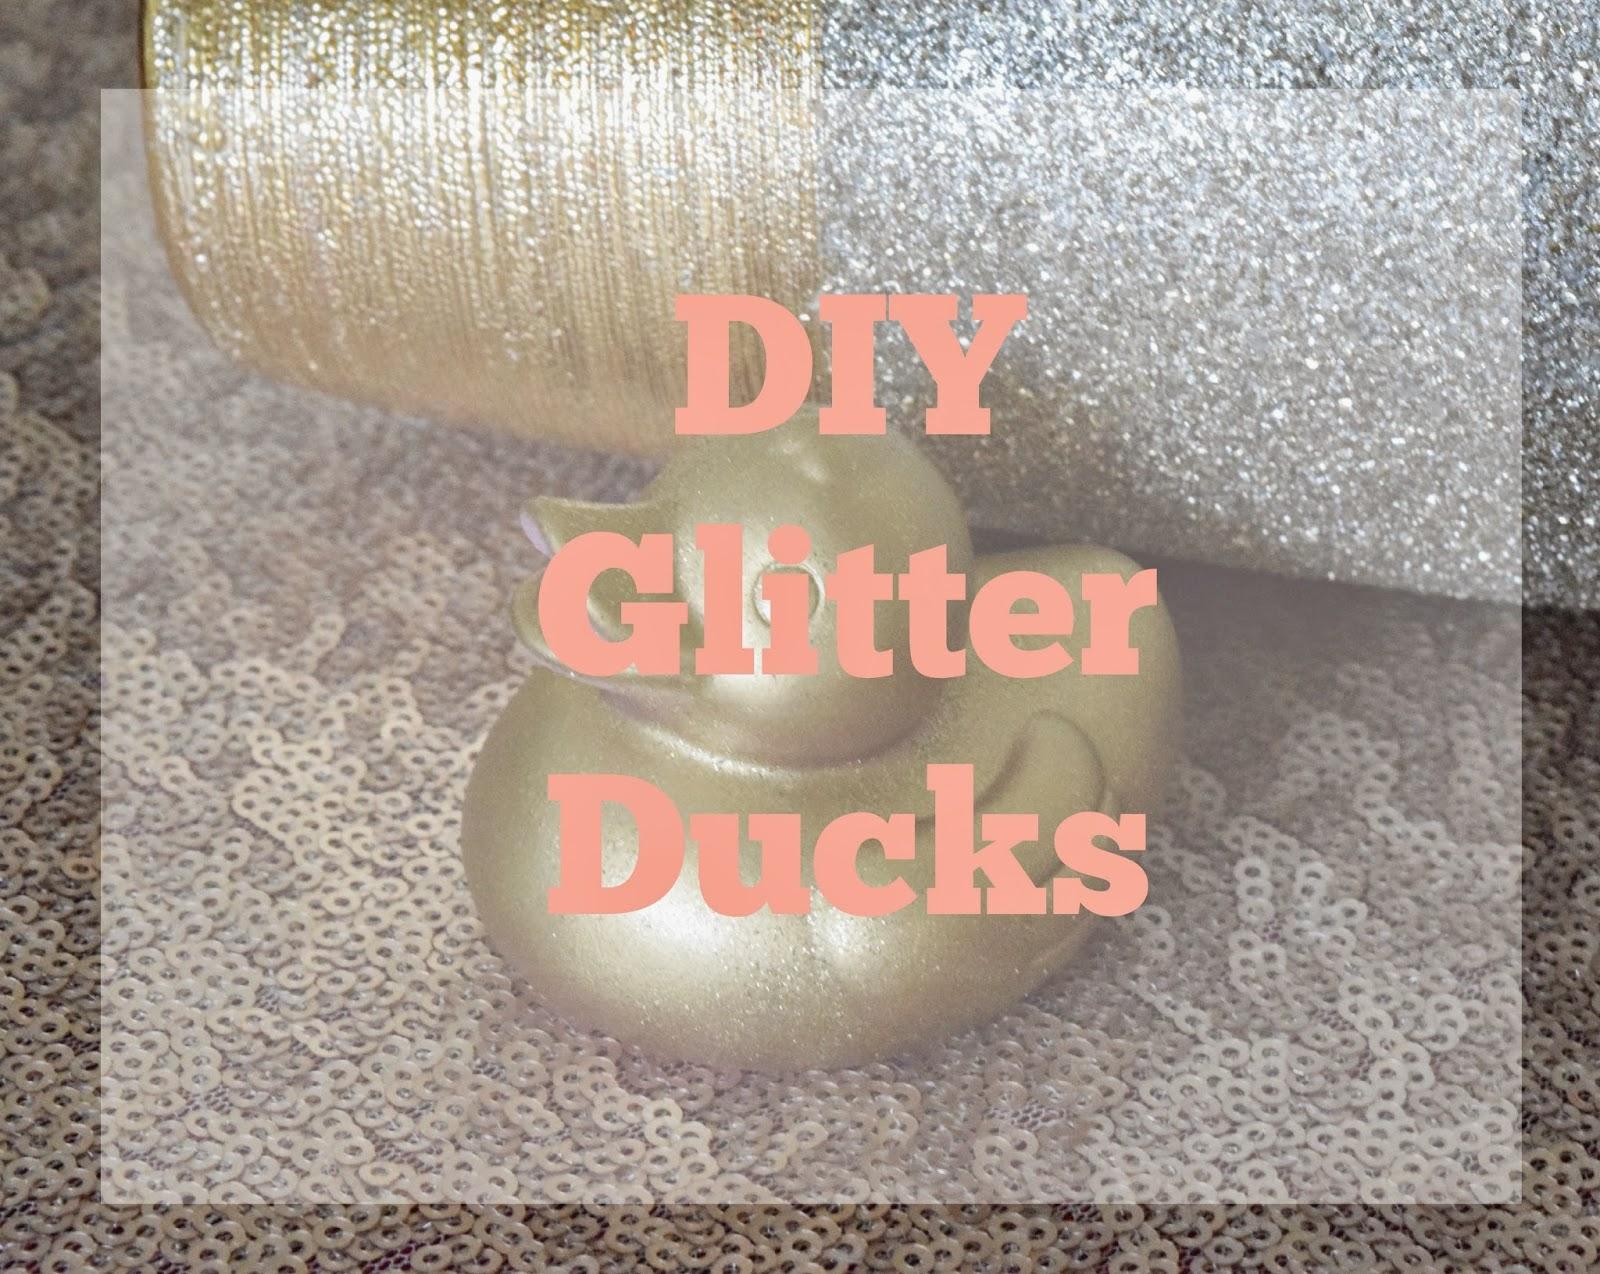 DIY Sparkly Rubber Ducks